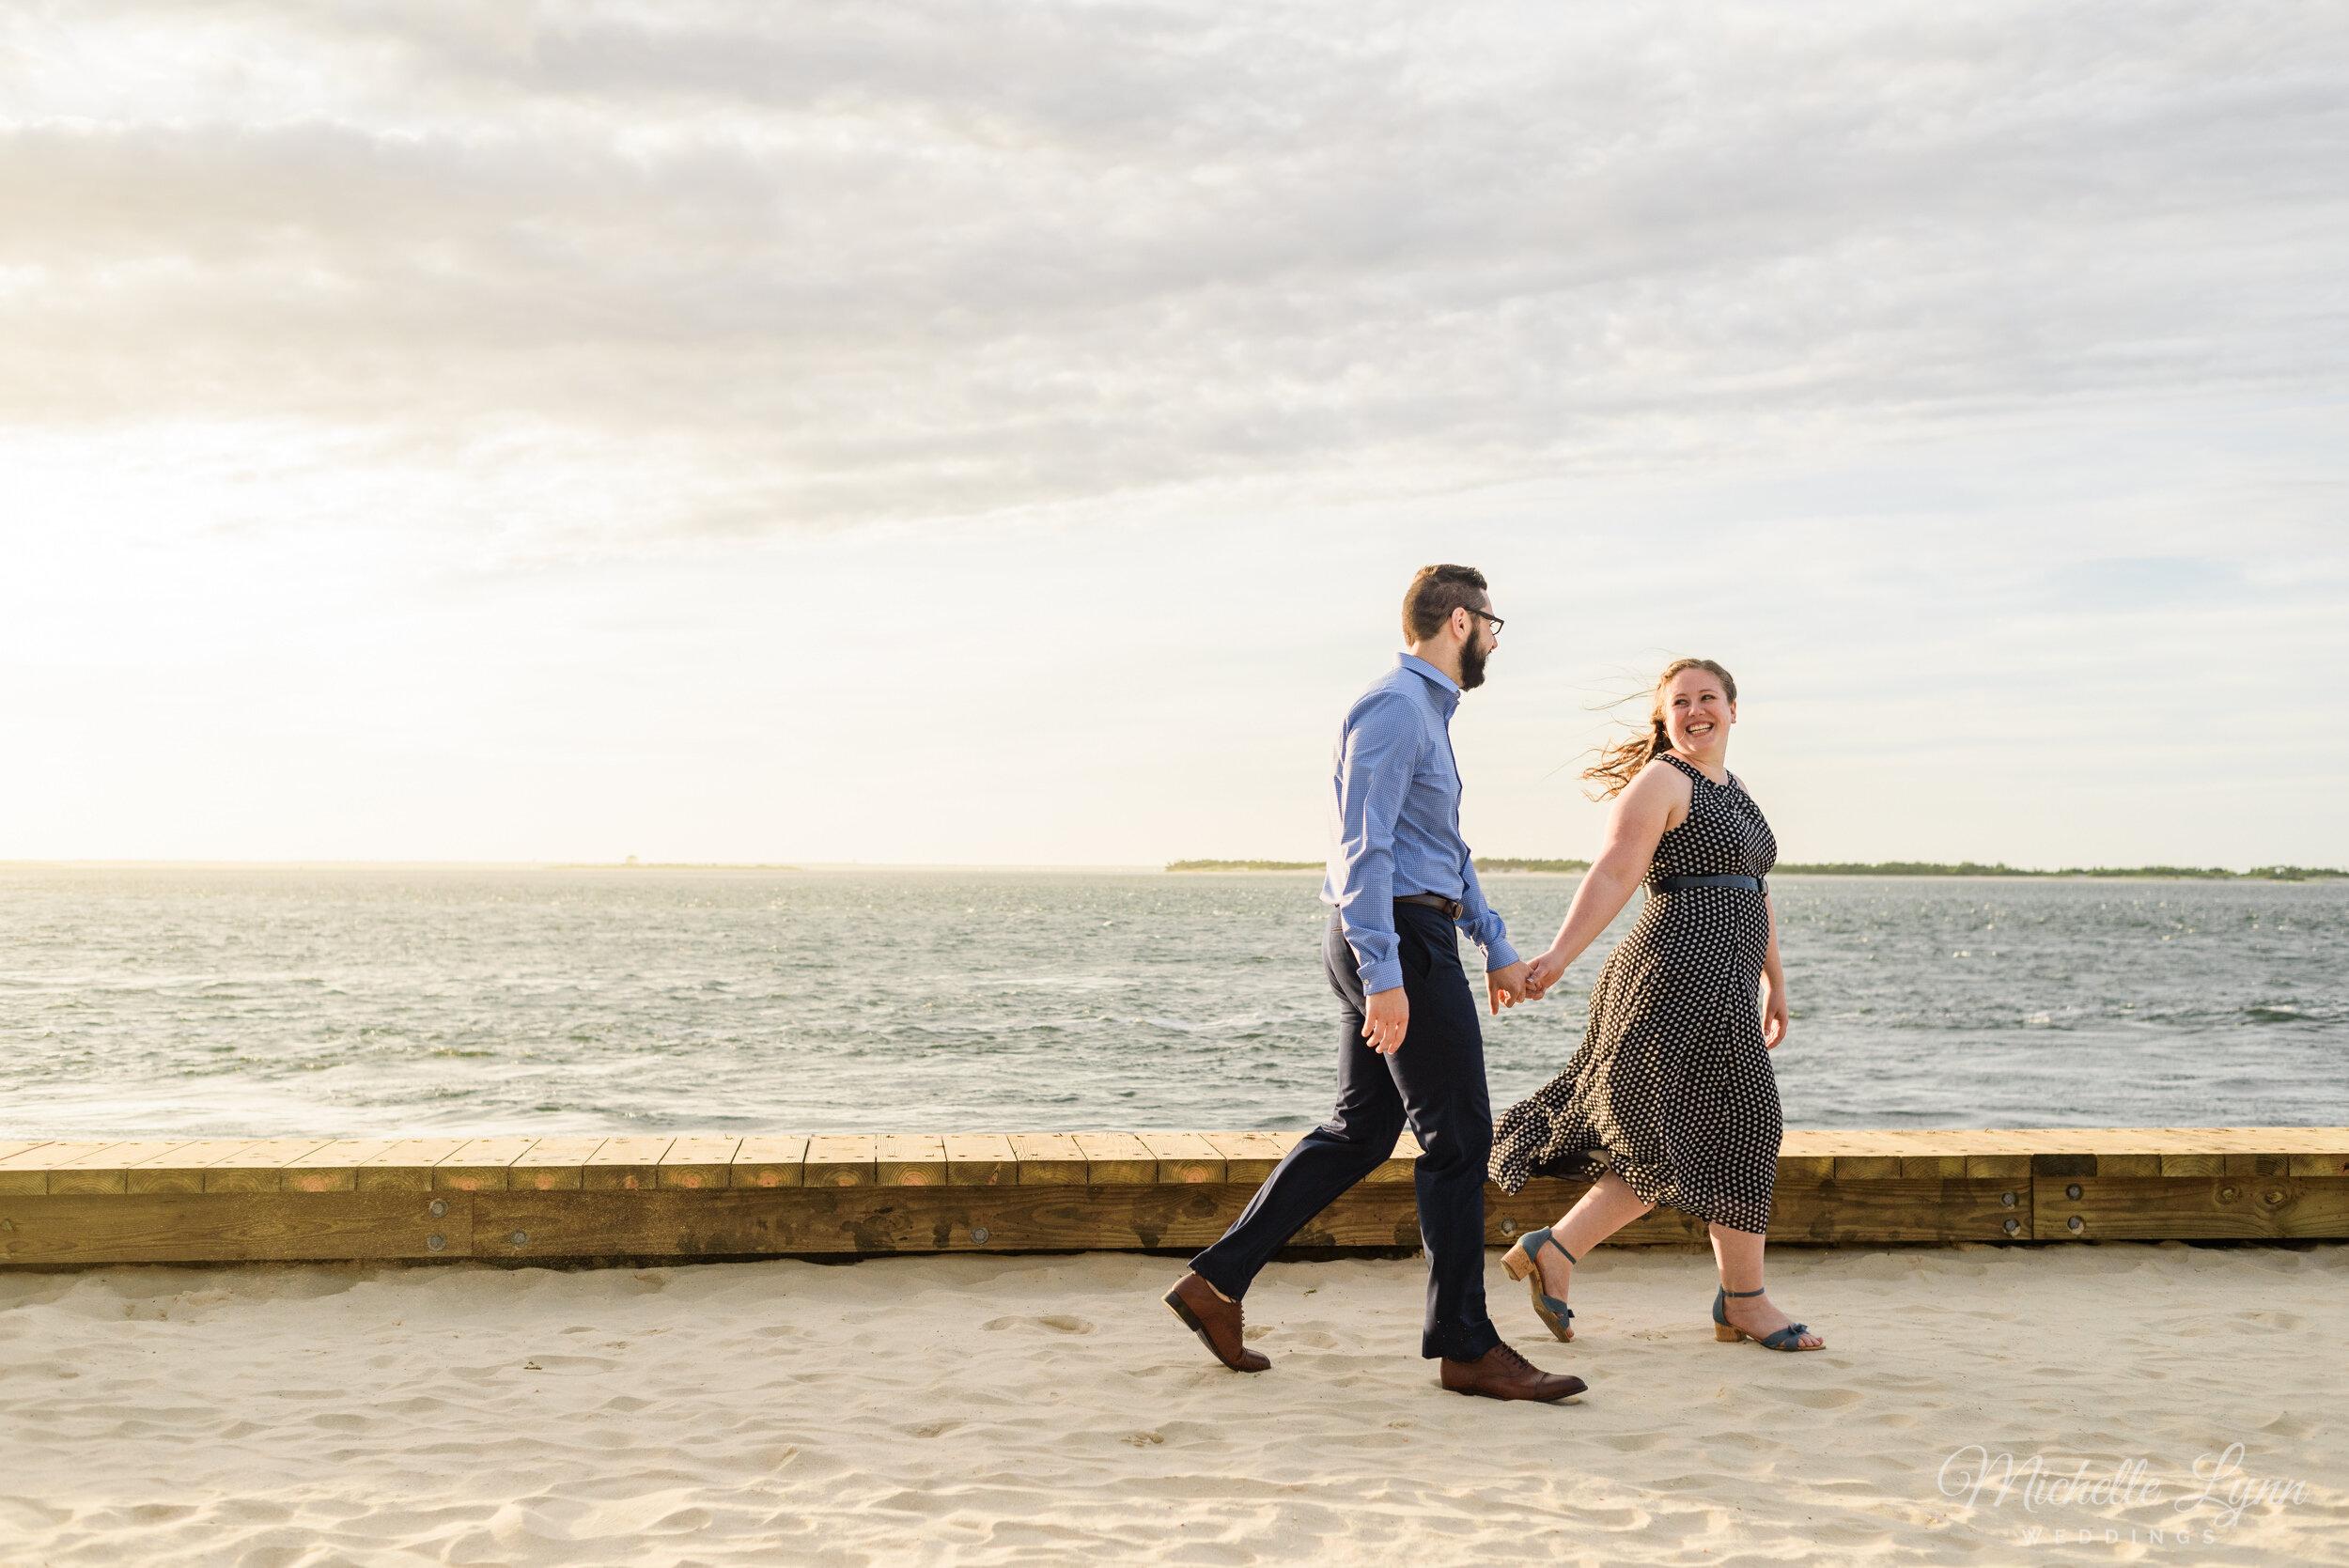 barnegat-lighthouse-engagement-photos-michelle-lynn-weddings-19.jpg